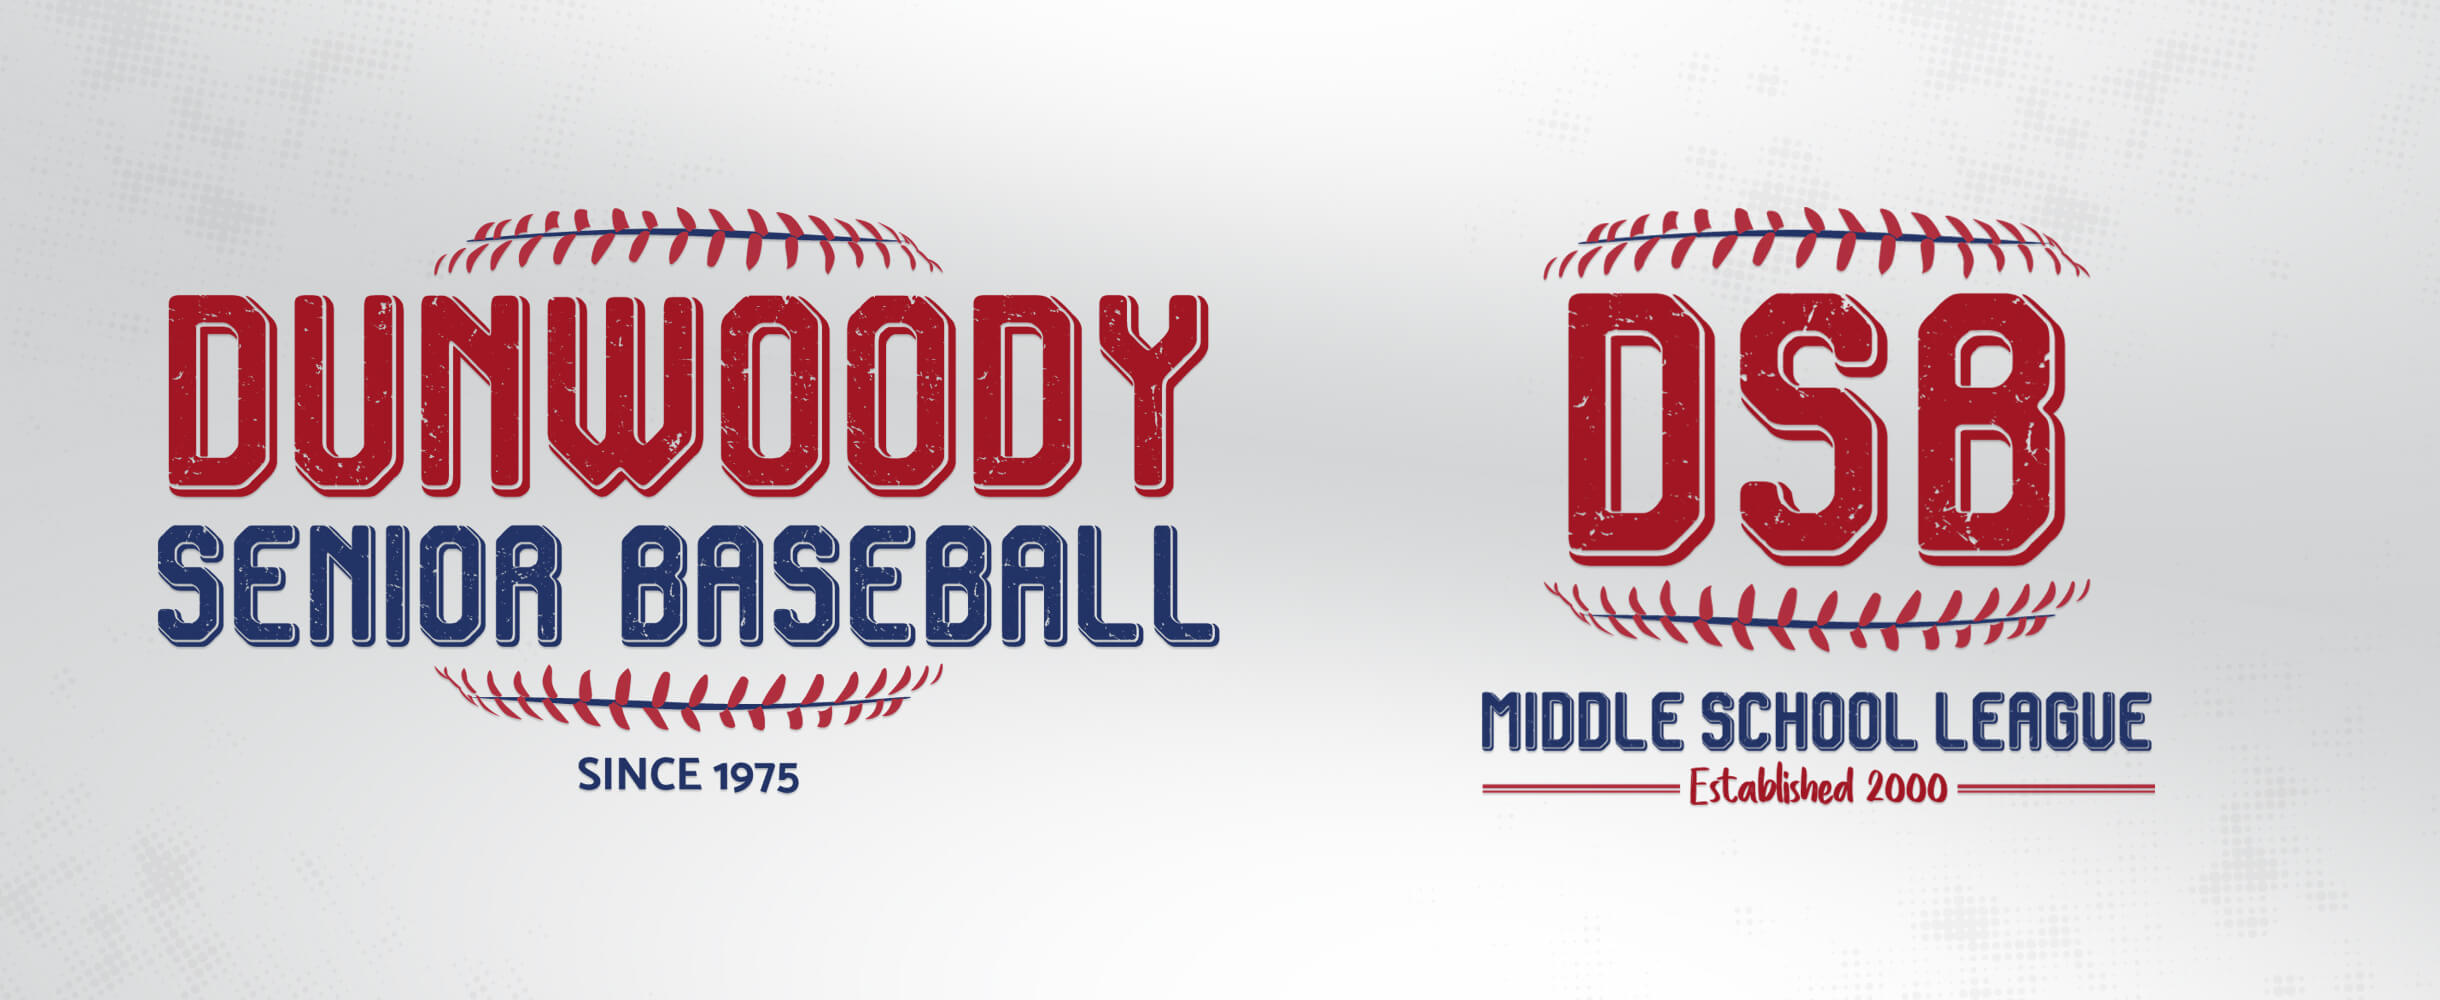 dunwoody senior baseball logos